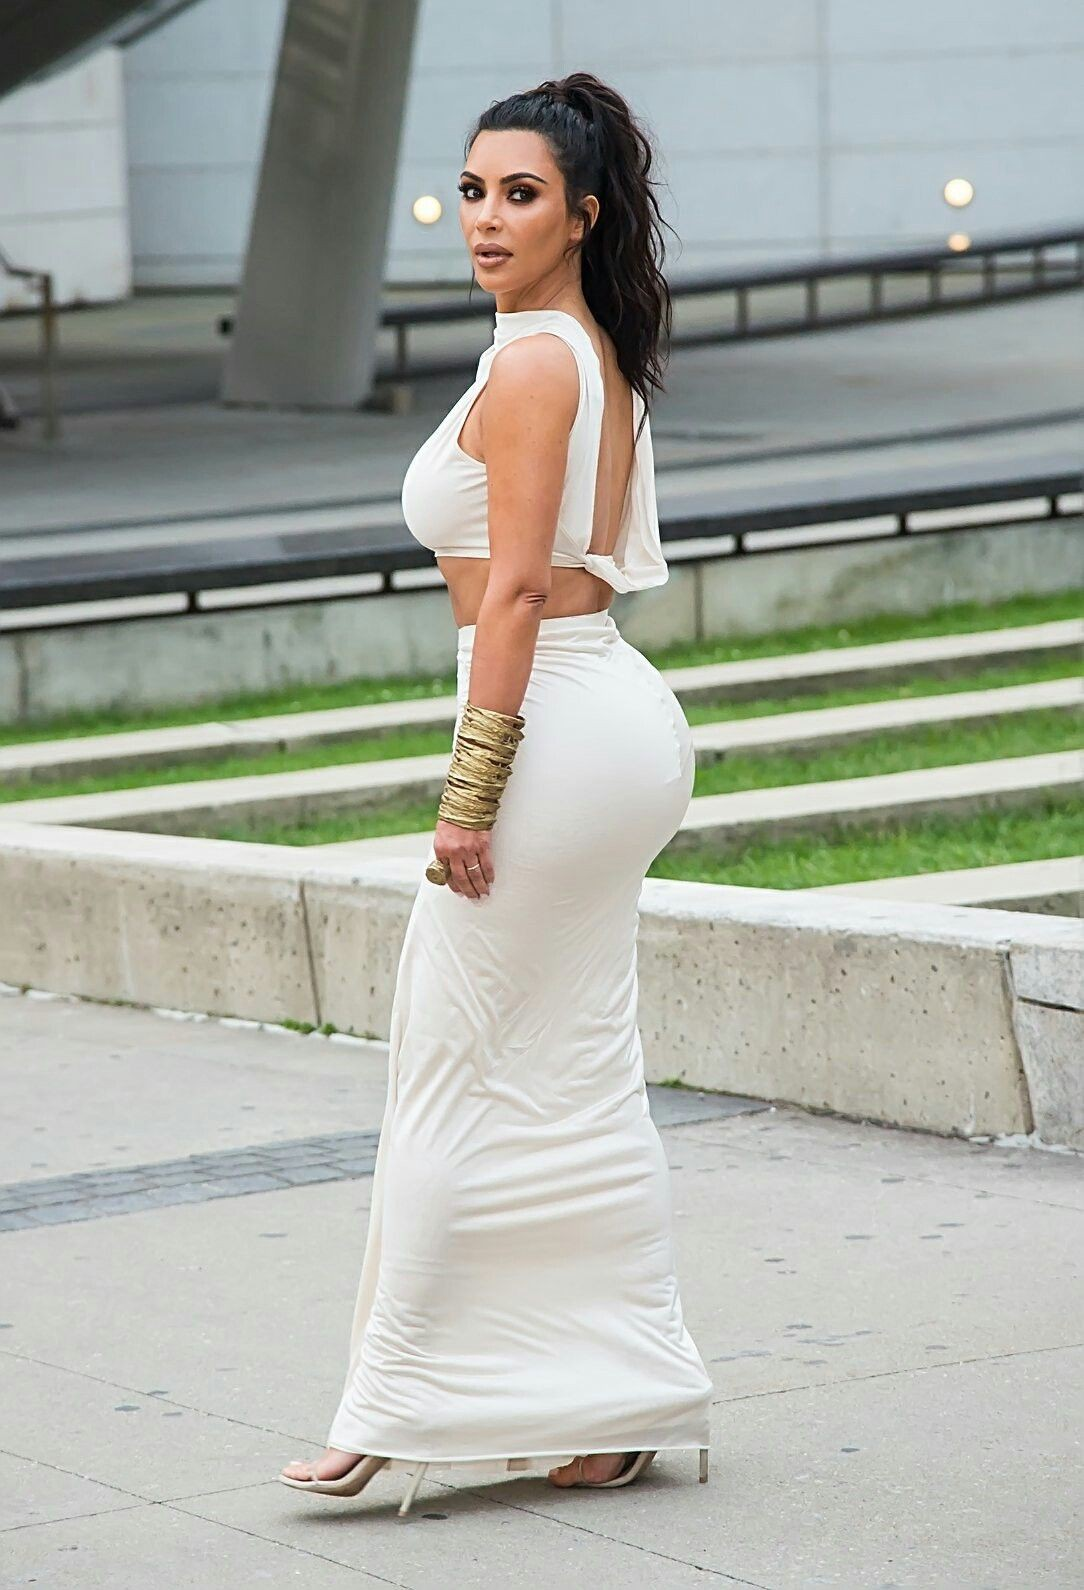 Kim kardashian hot white dress